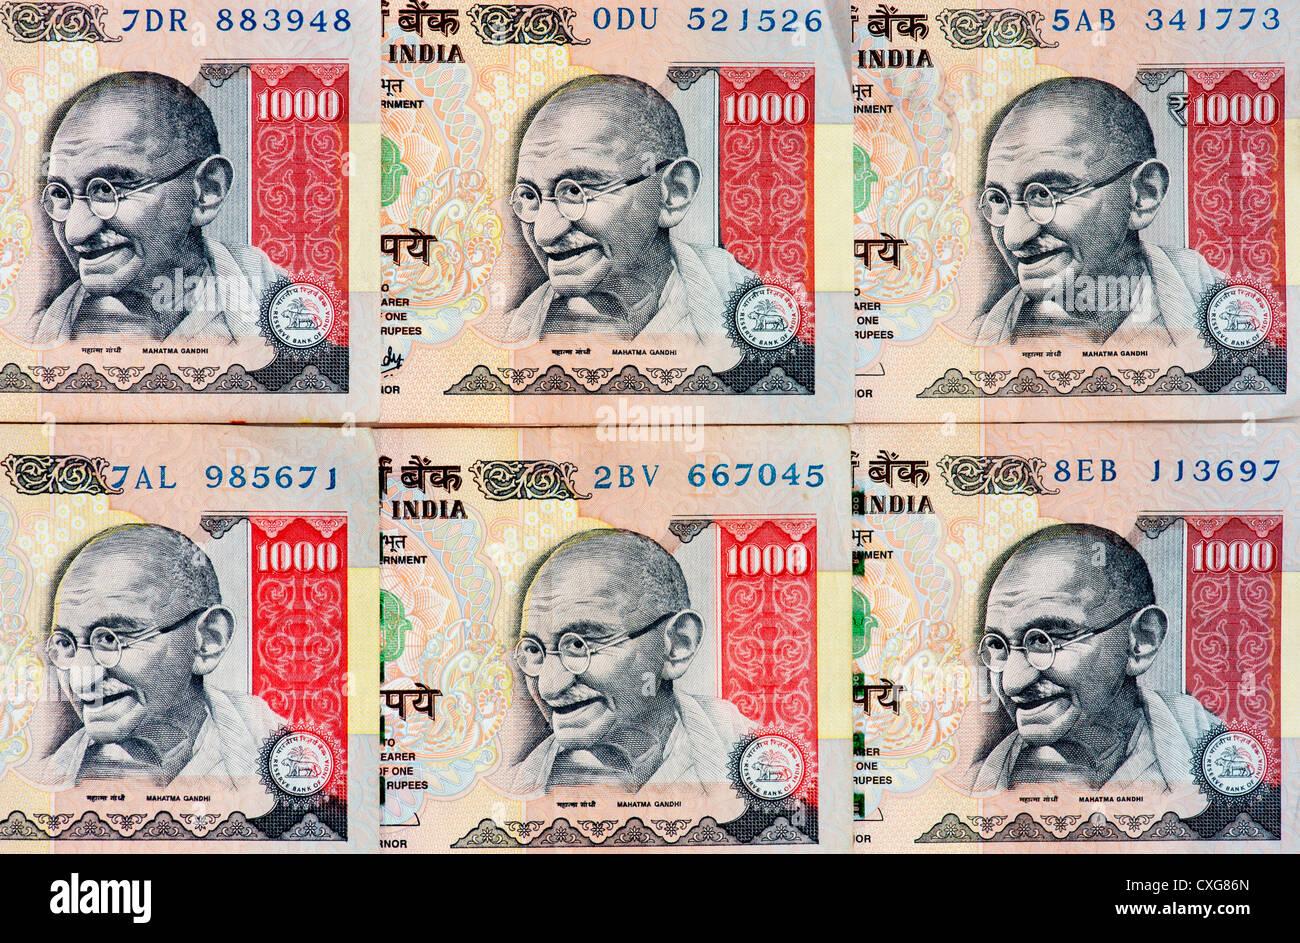 Indian thousand rupee notes - Stock Image